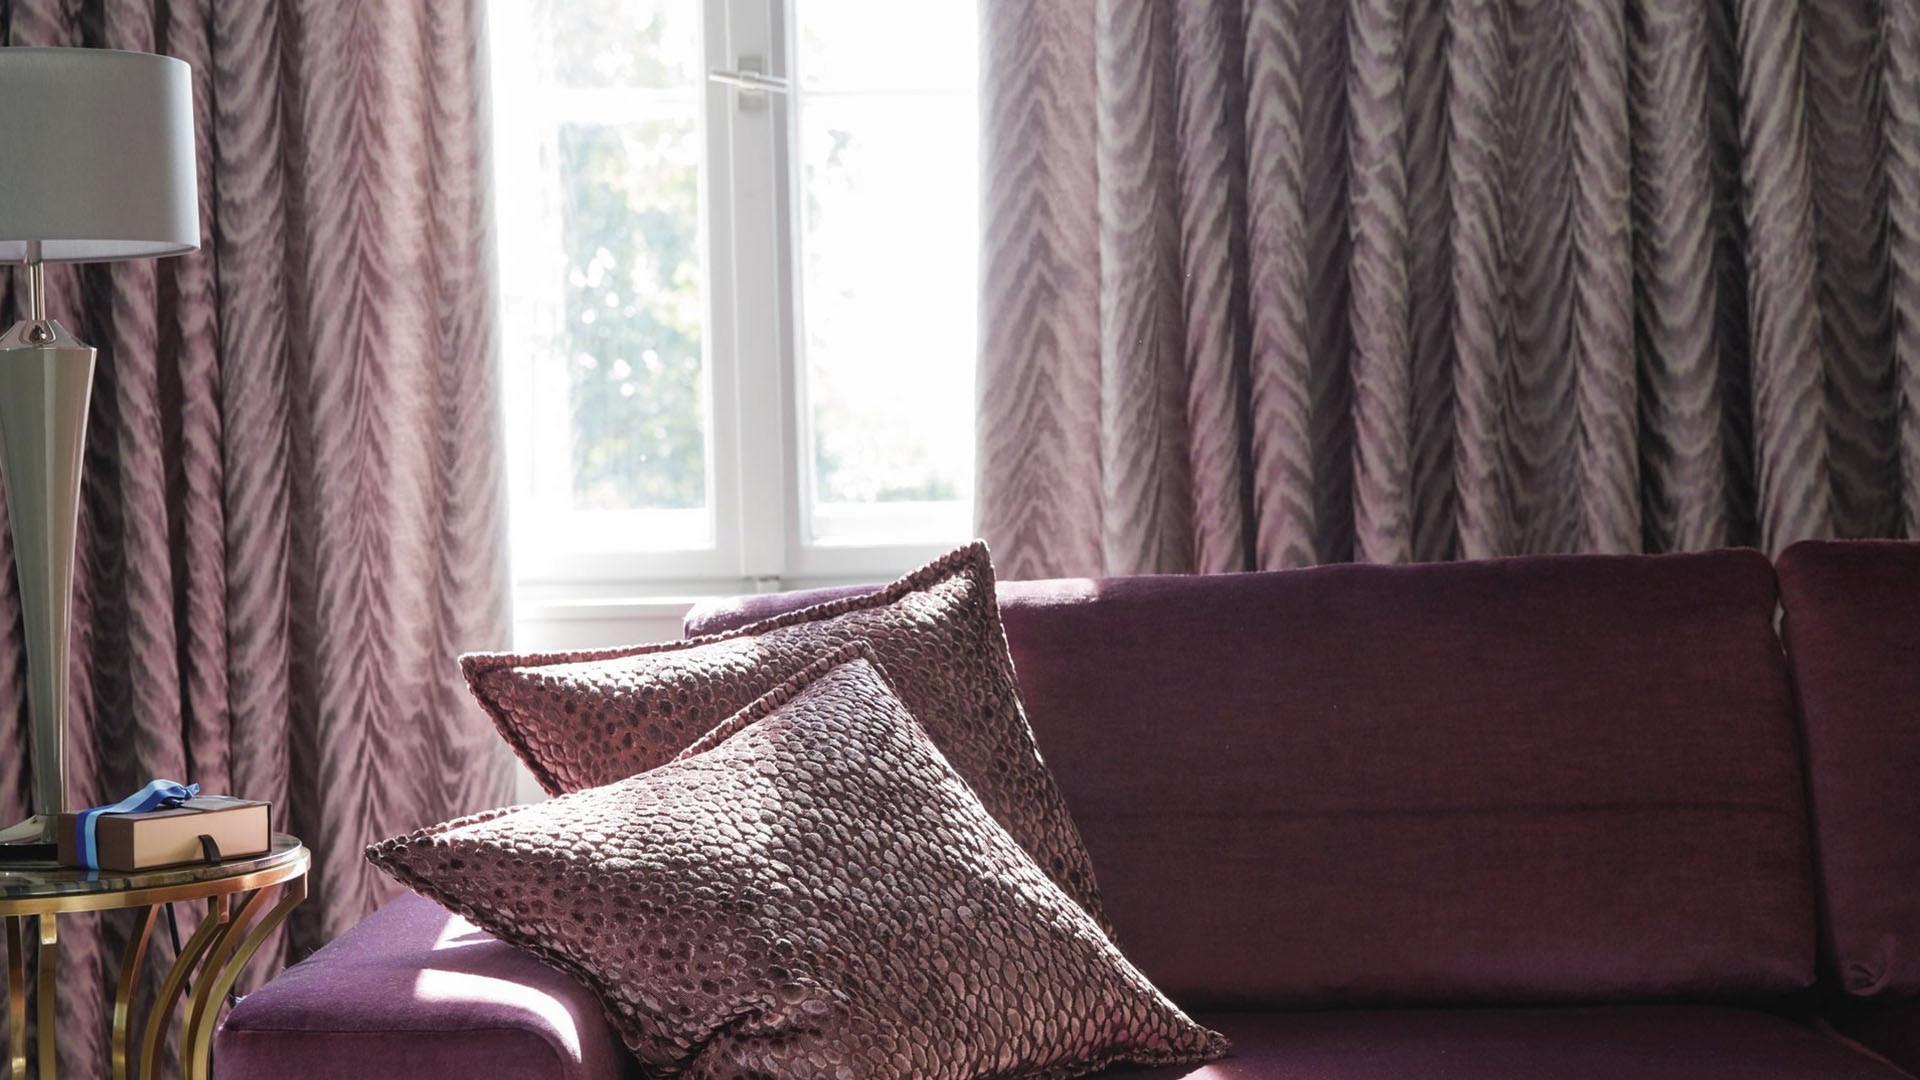 stoff fr gardinen cheap stoff olymp fr von fuggerhaus with stoff fr gardinen free ga neue. Black Bedroom Furniture Sets. Home Design Ideas